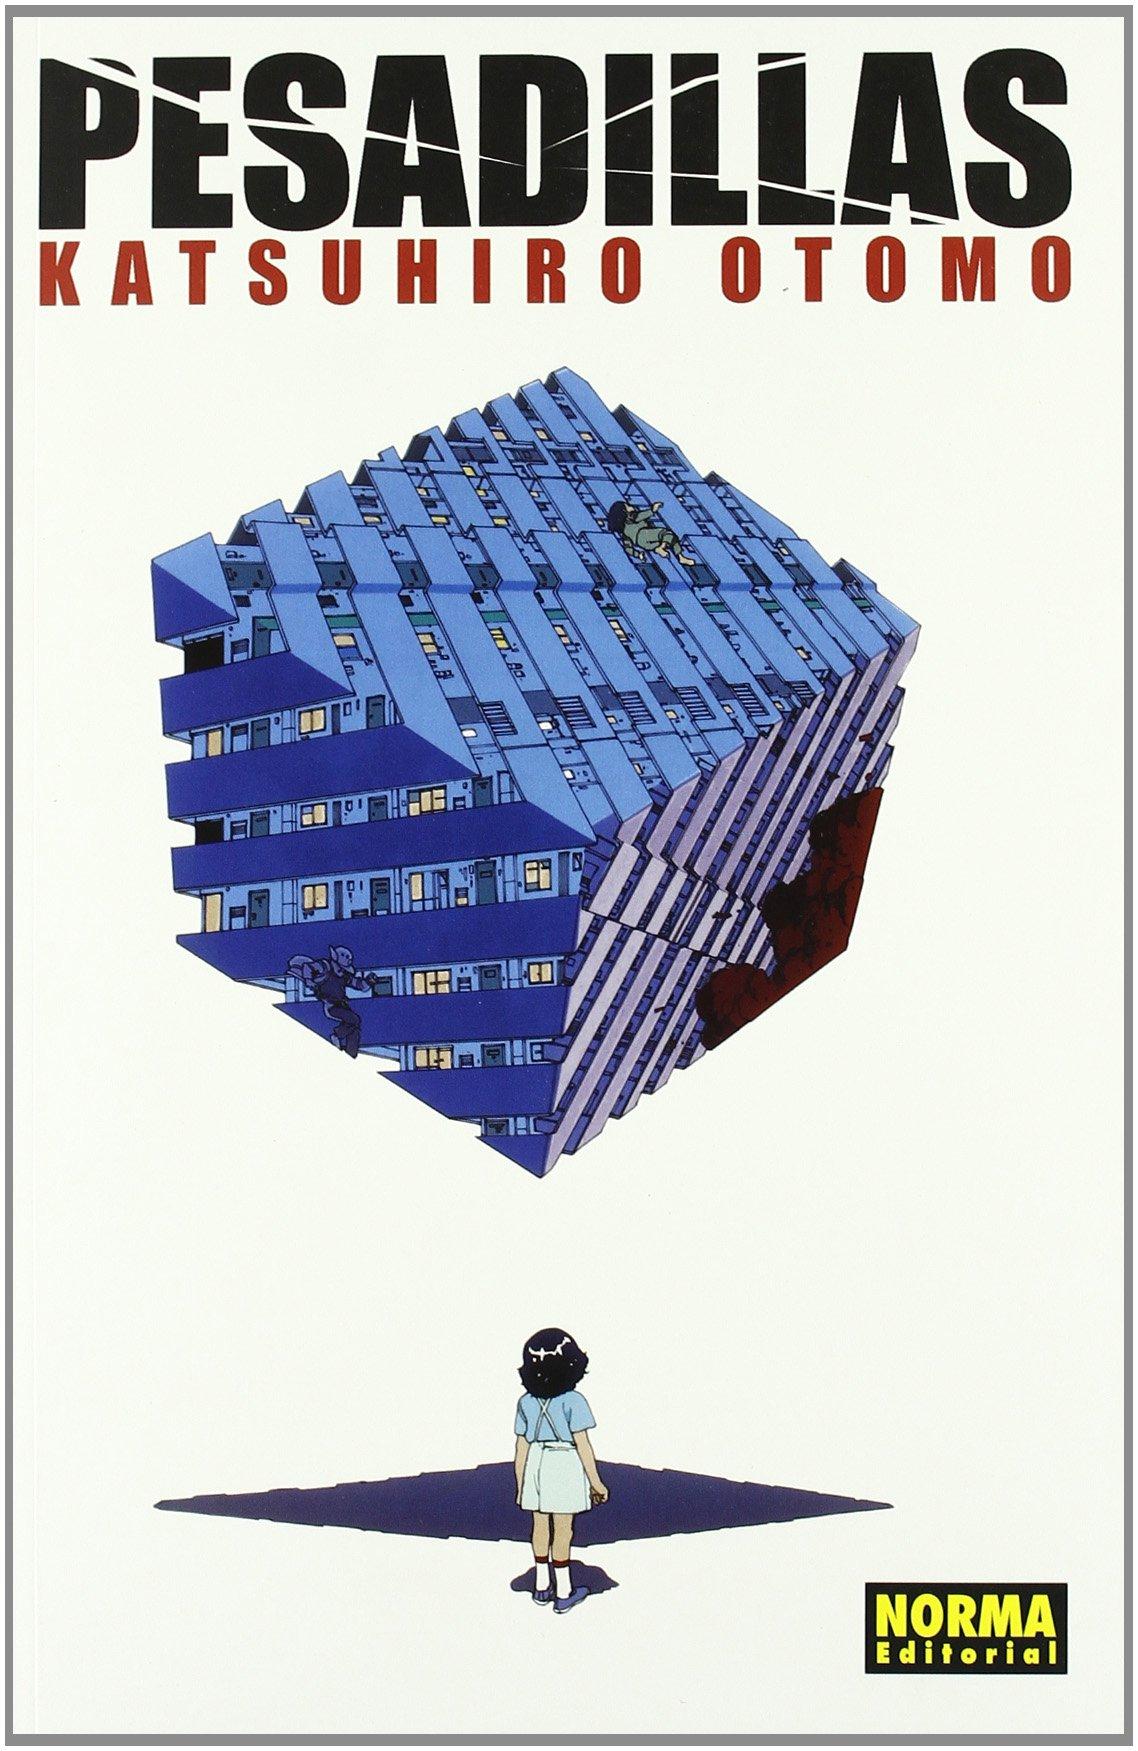 PESADILLAS (SENSEI MANGA) Tapa blanda – 1 dic 2003 Katsuhiro Otomo Norma Editorial 8484319016 931030